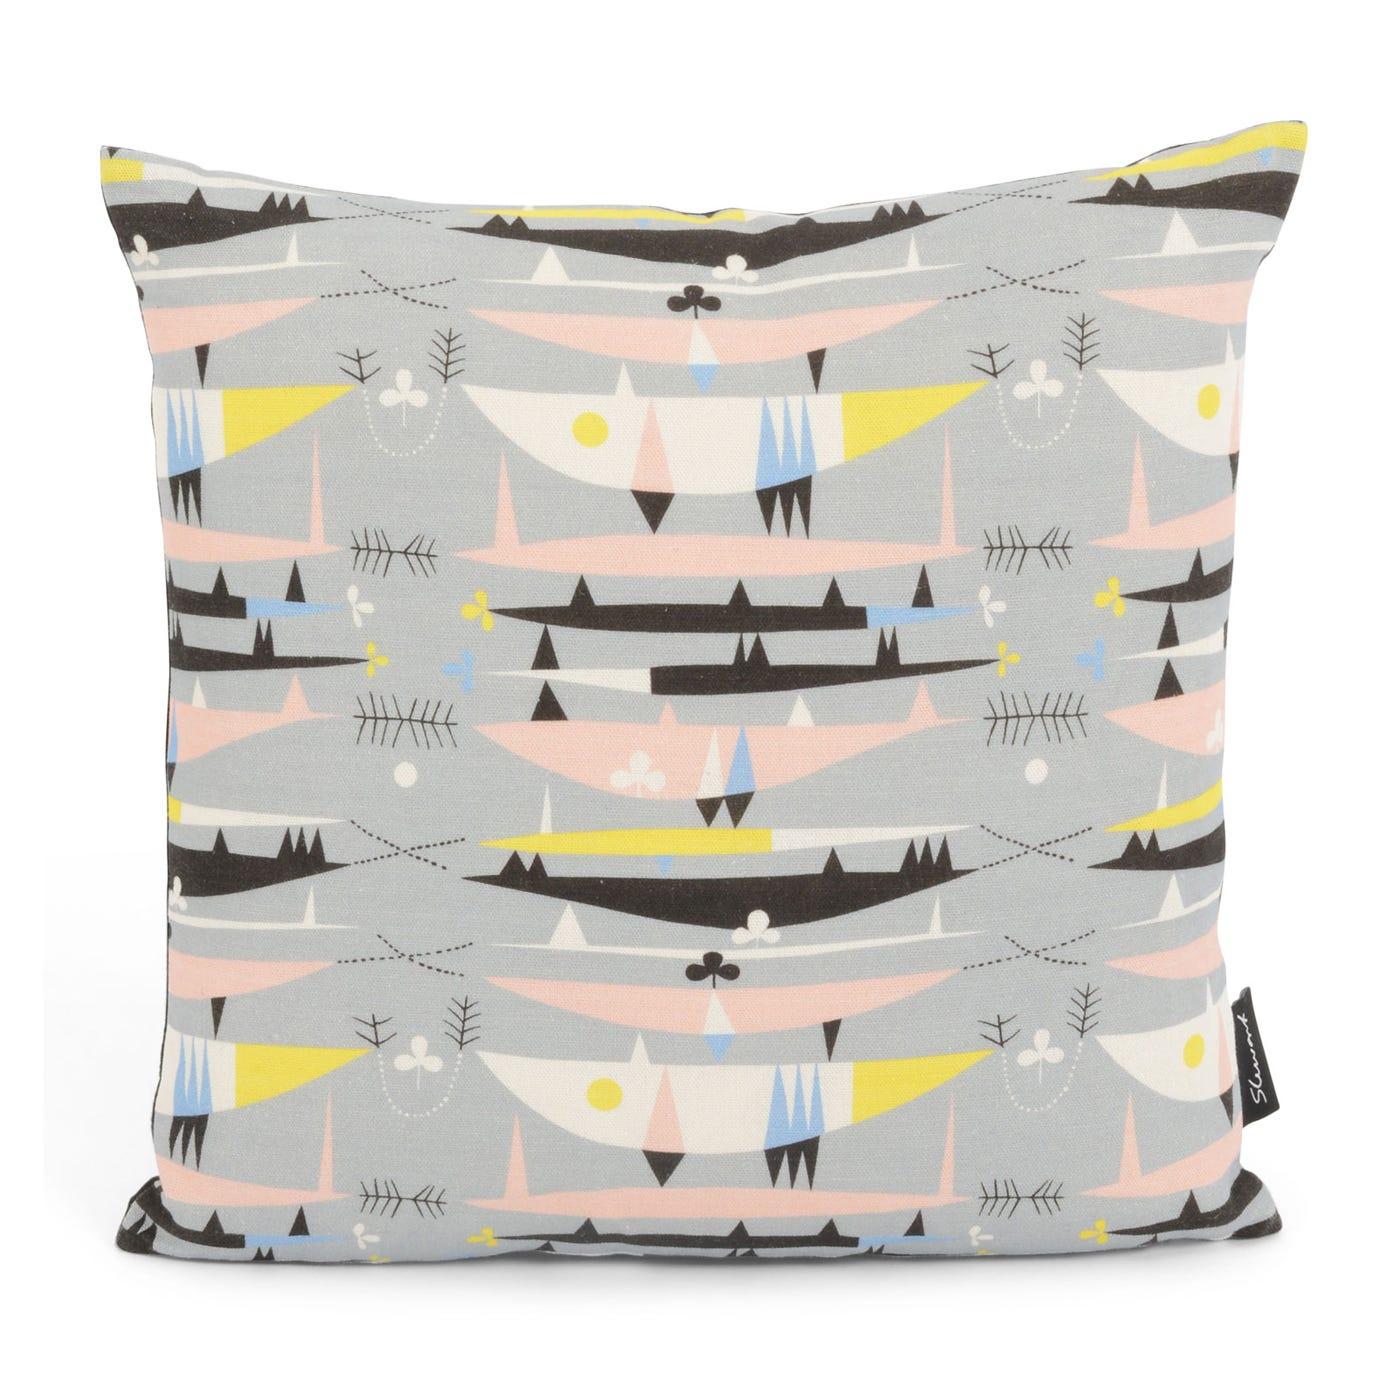 Raimoult Cushion